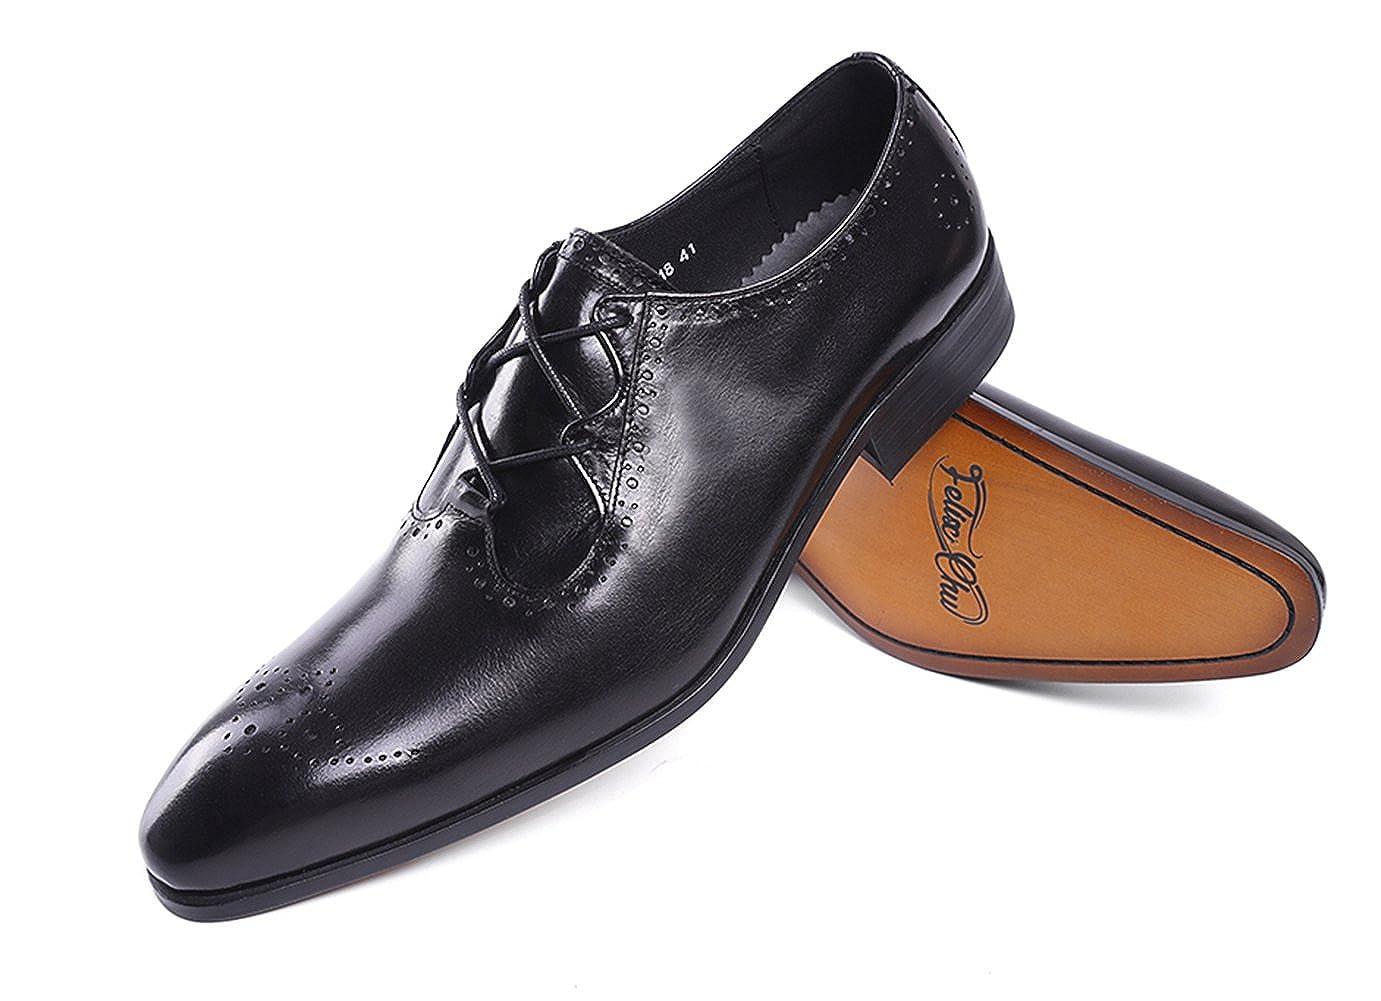 d7f0b35d266e ... Felix Chu Men s Italian Shoes Designer Luxury Perfect Genuine Calf Leather  Shoes Italian Men Dress Shoes ...